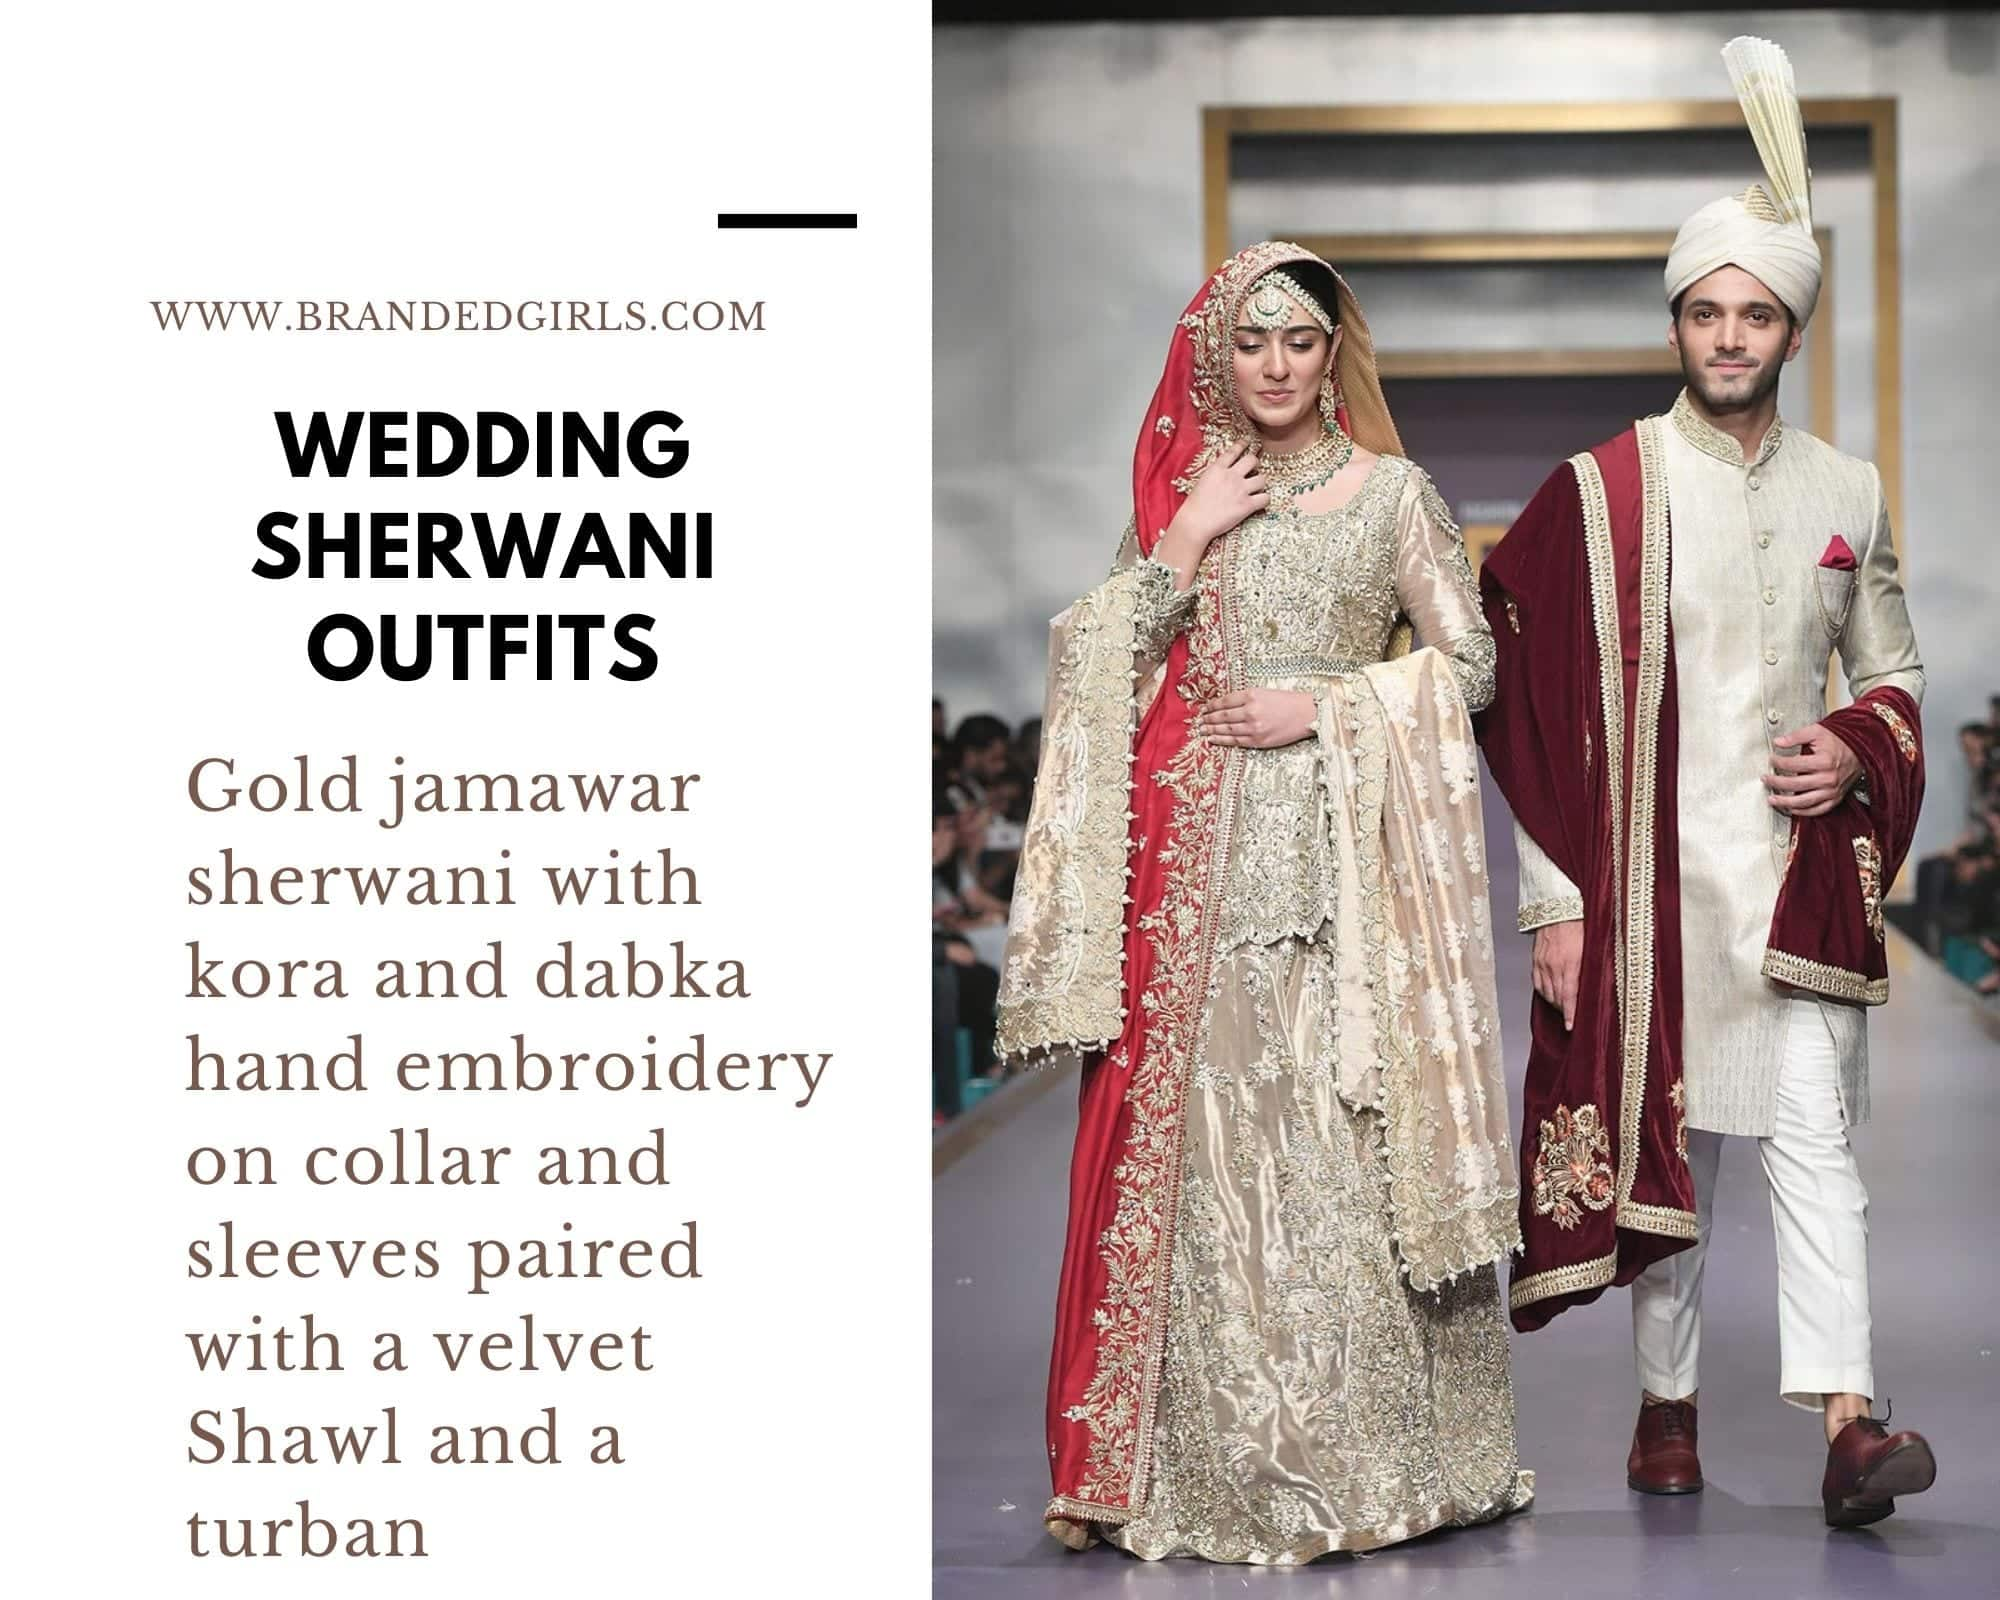 Deepak-Perwani Wedding Sherwani Outfits - 20 Best Sherwani Ideas for Grooms